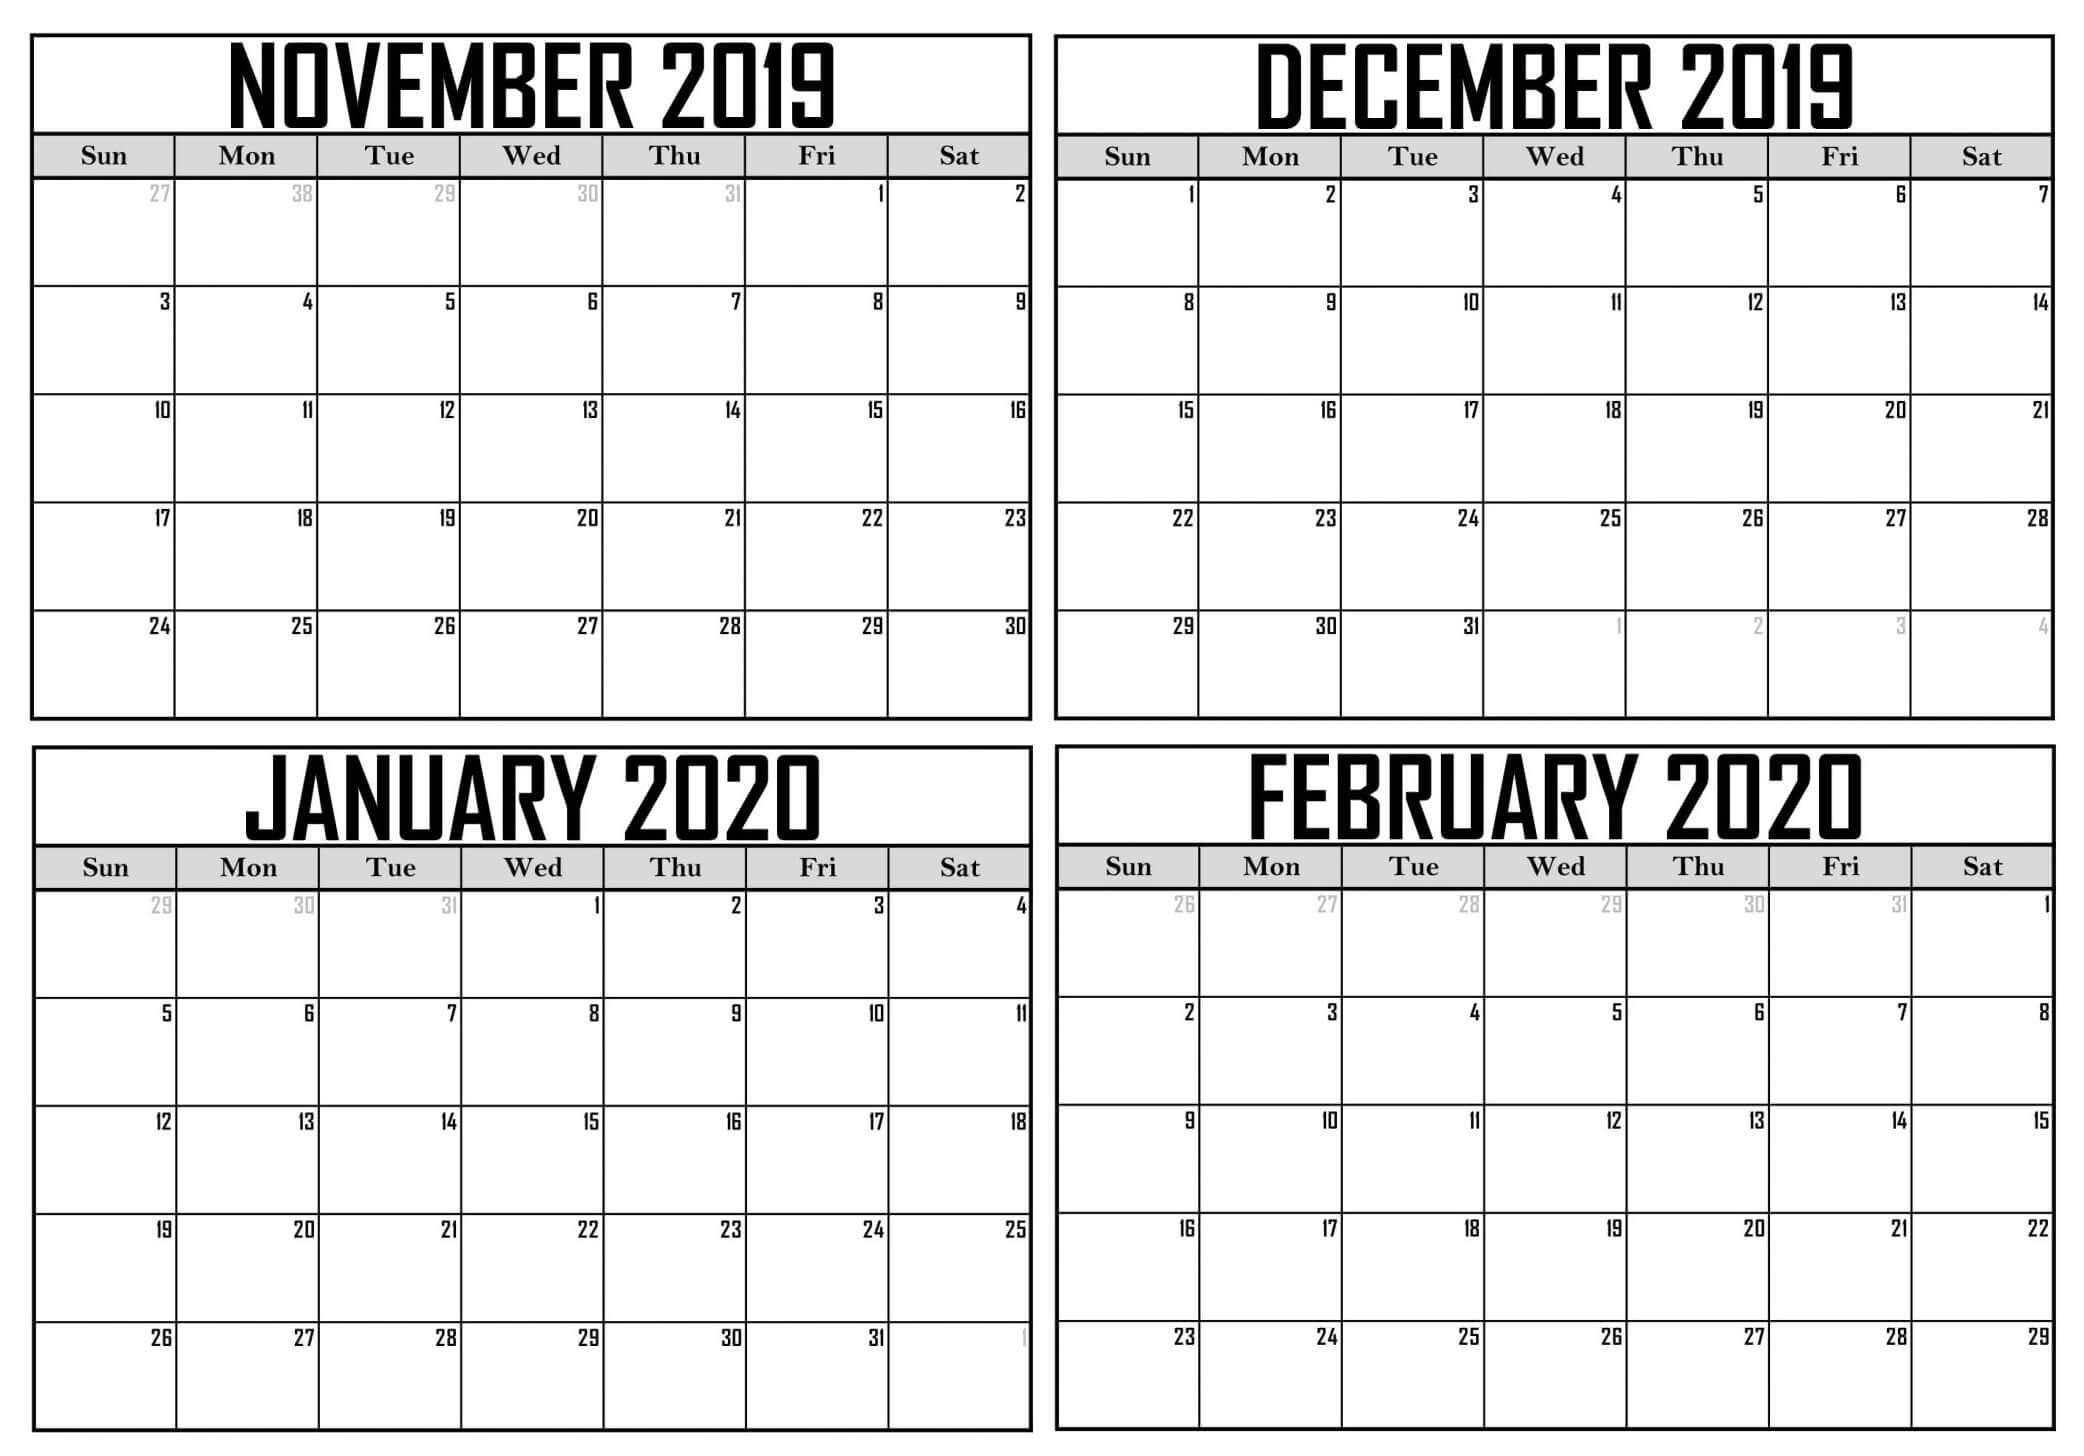 Blank November 2019 To February 2020 Calendar - 2019